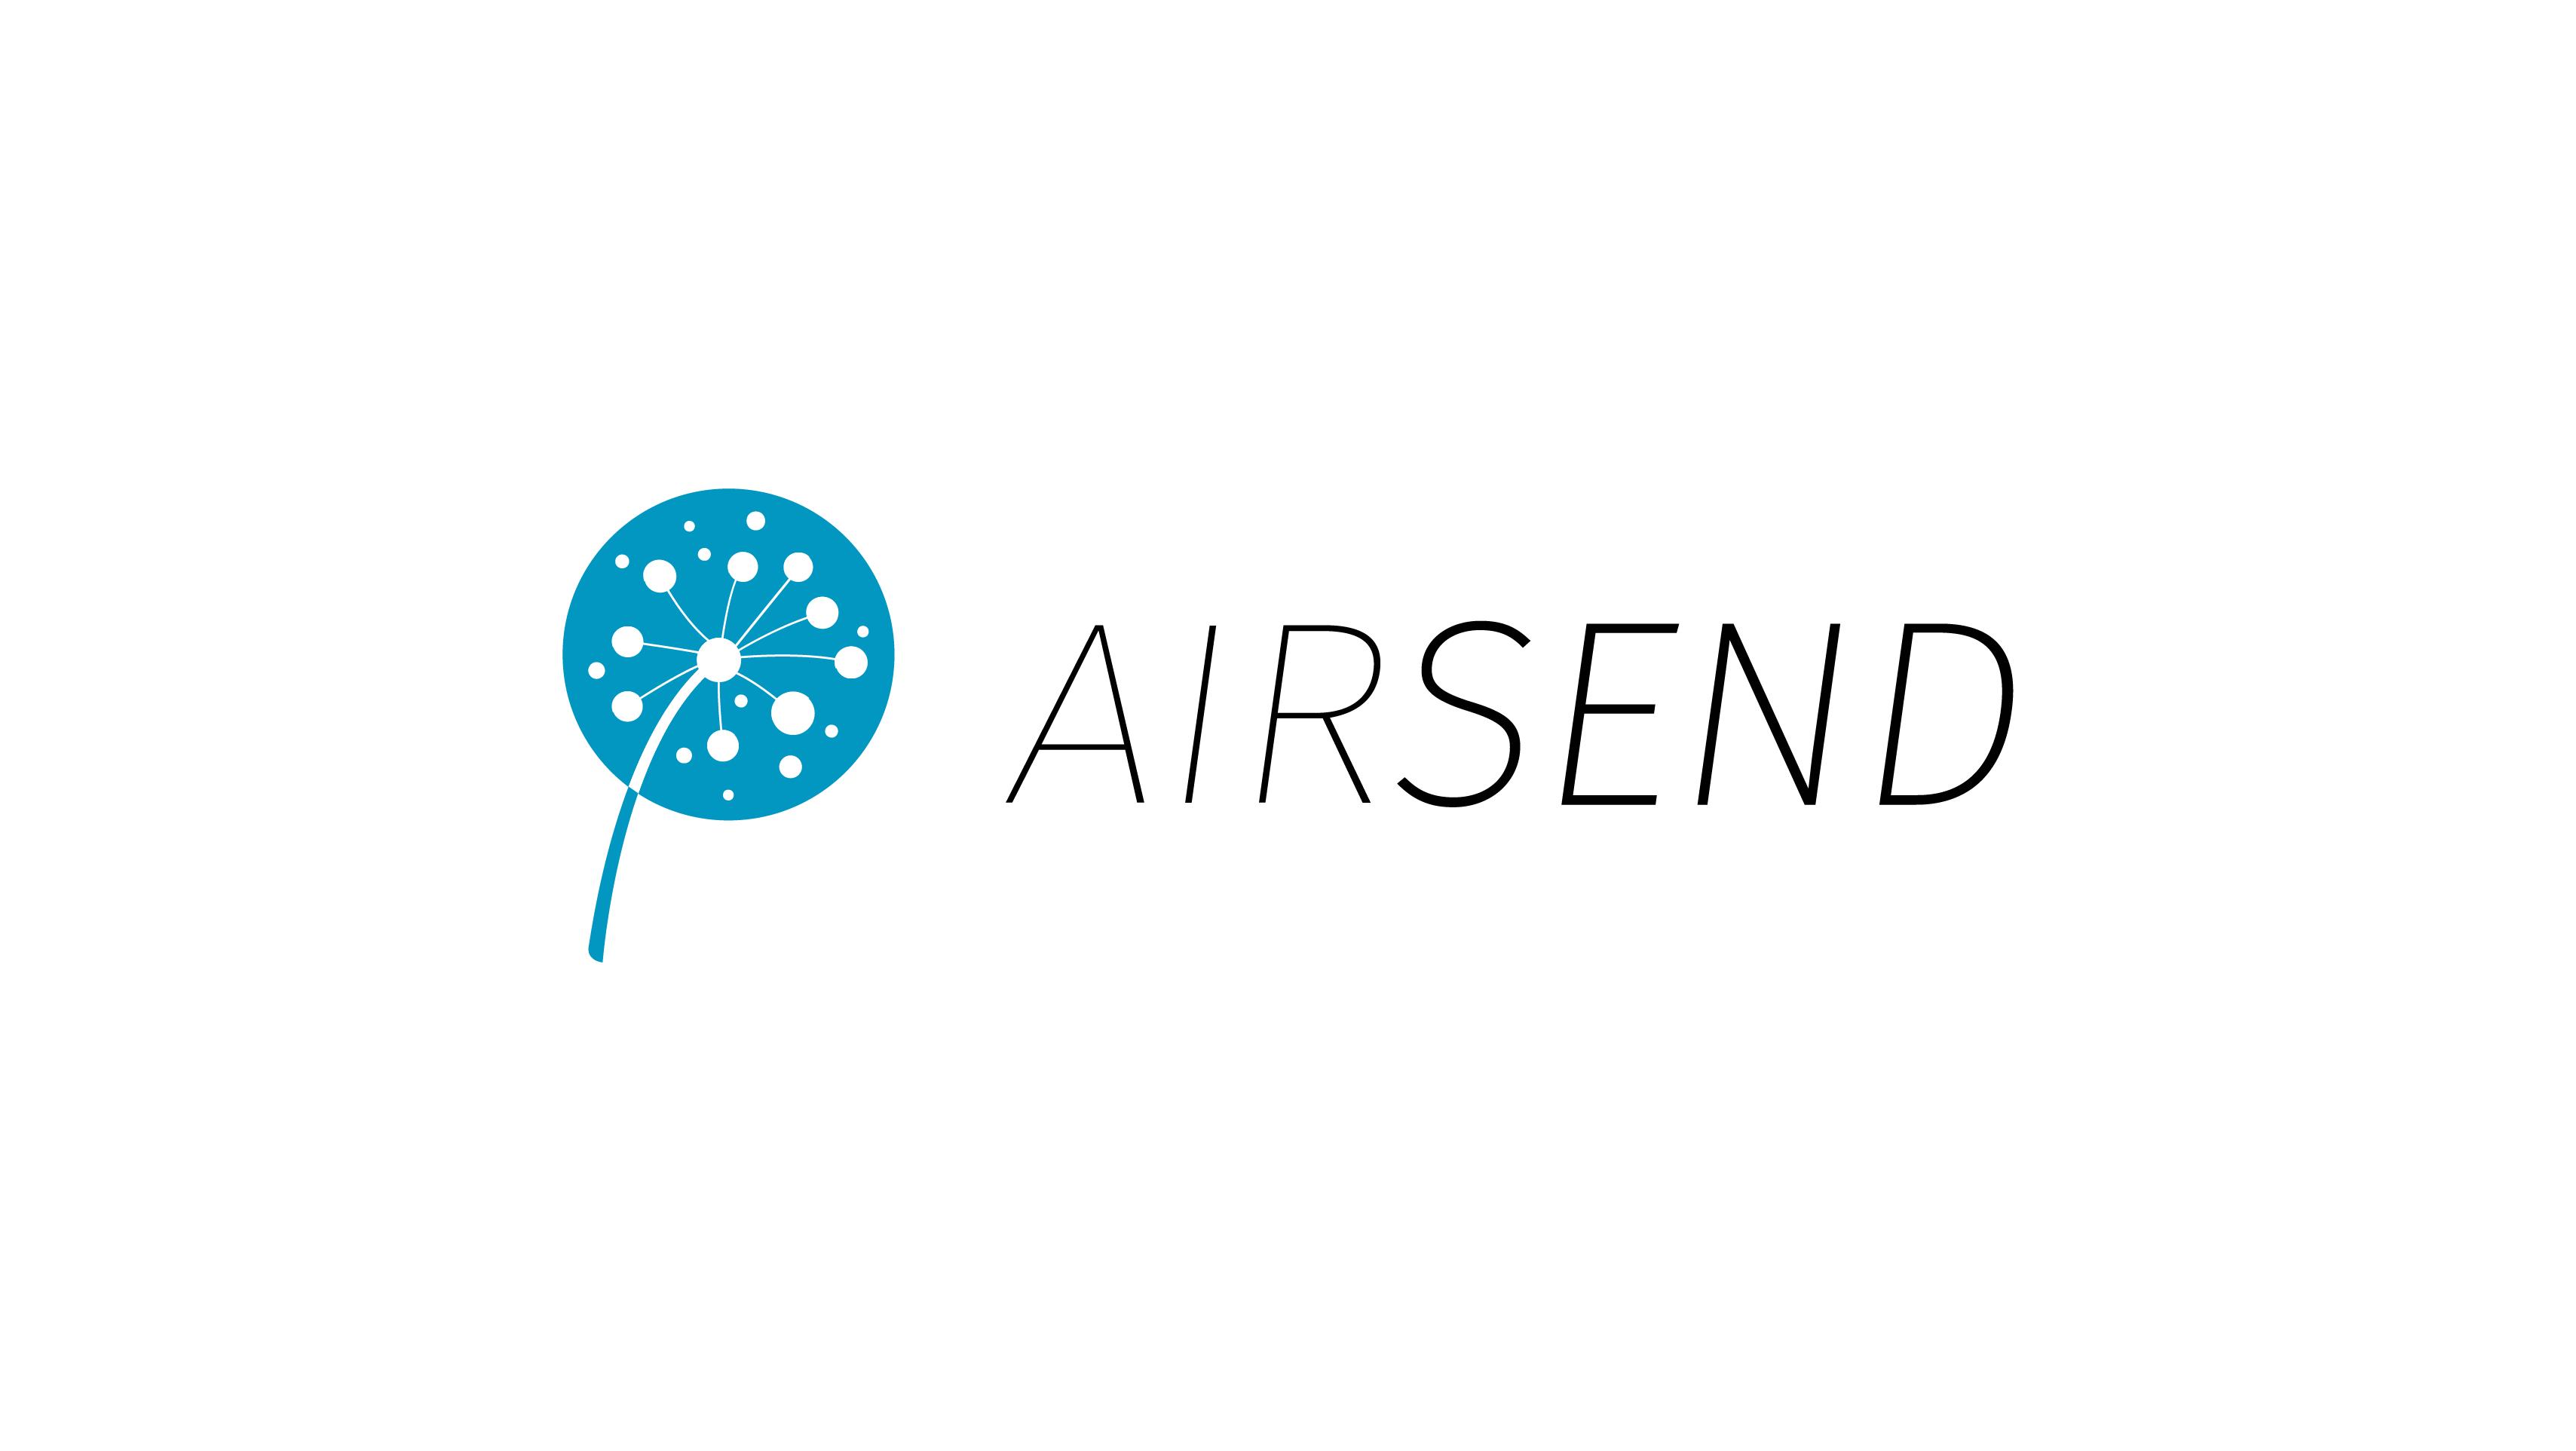 AirSend logo